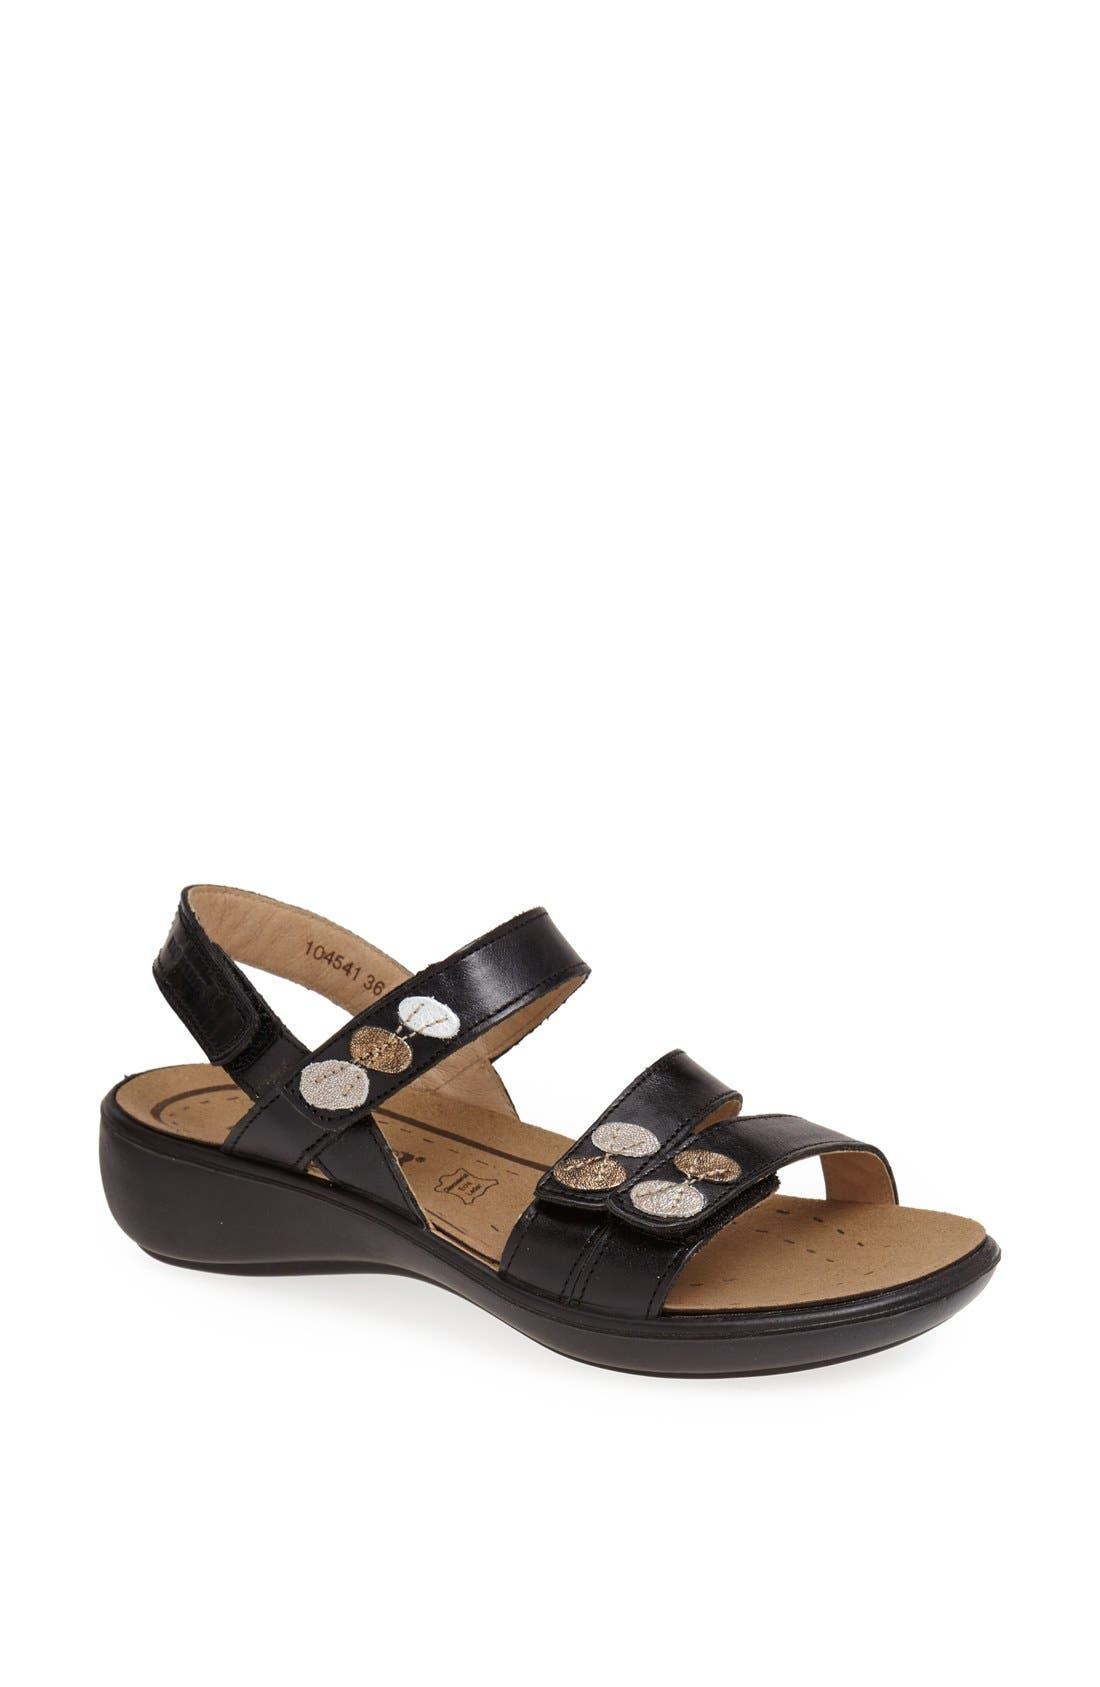 Romika® 'Ibiza 55' Leather Sandal